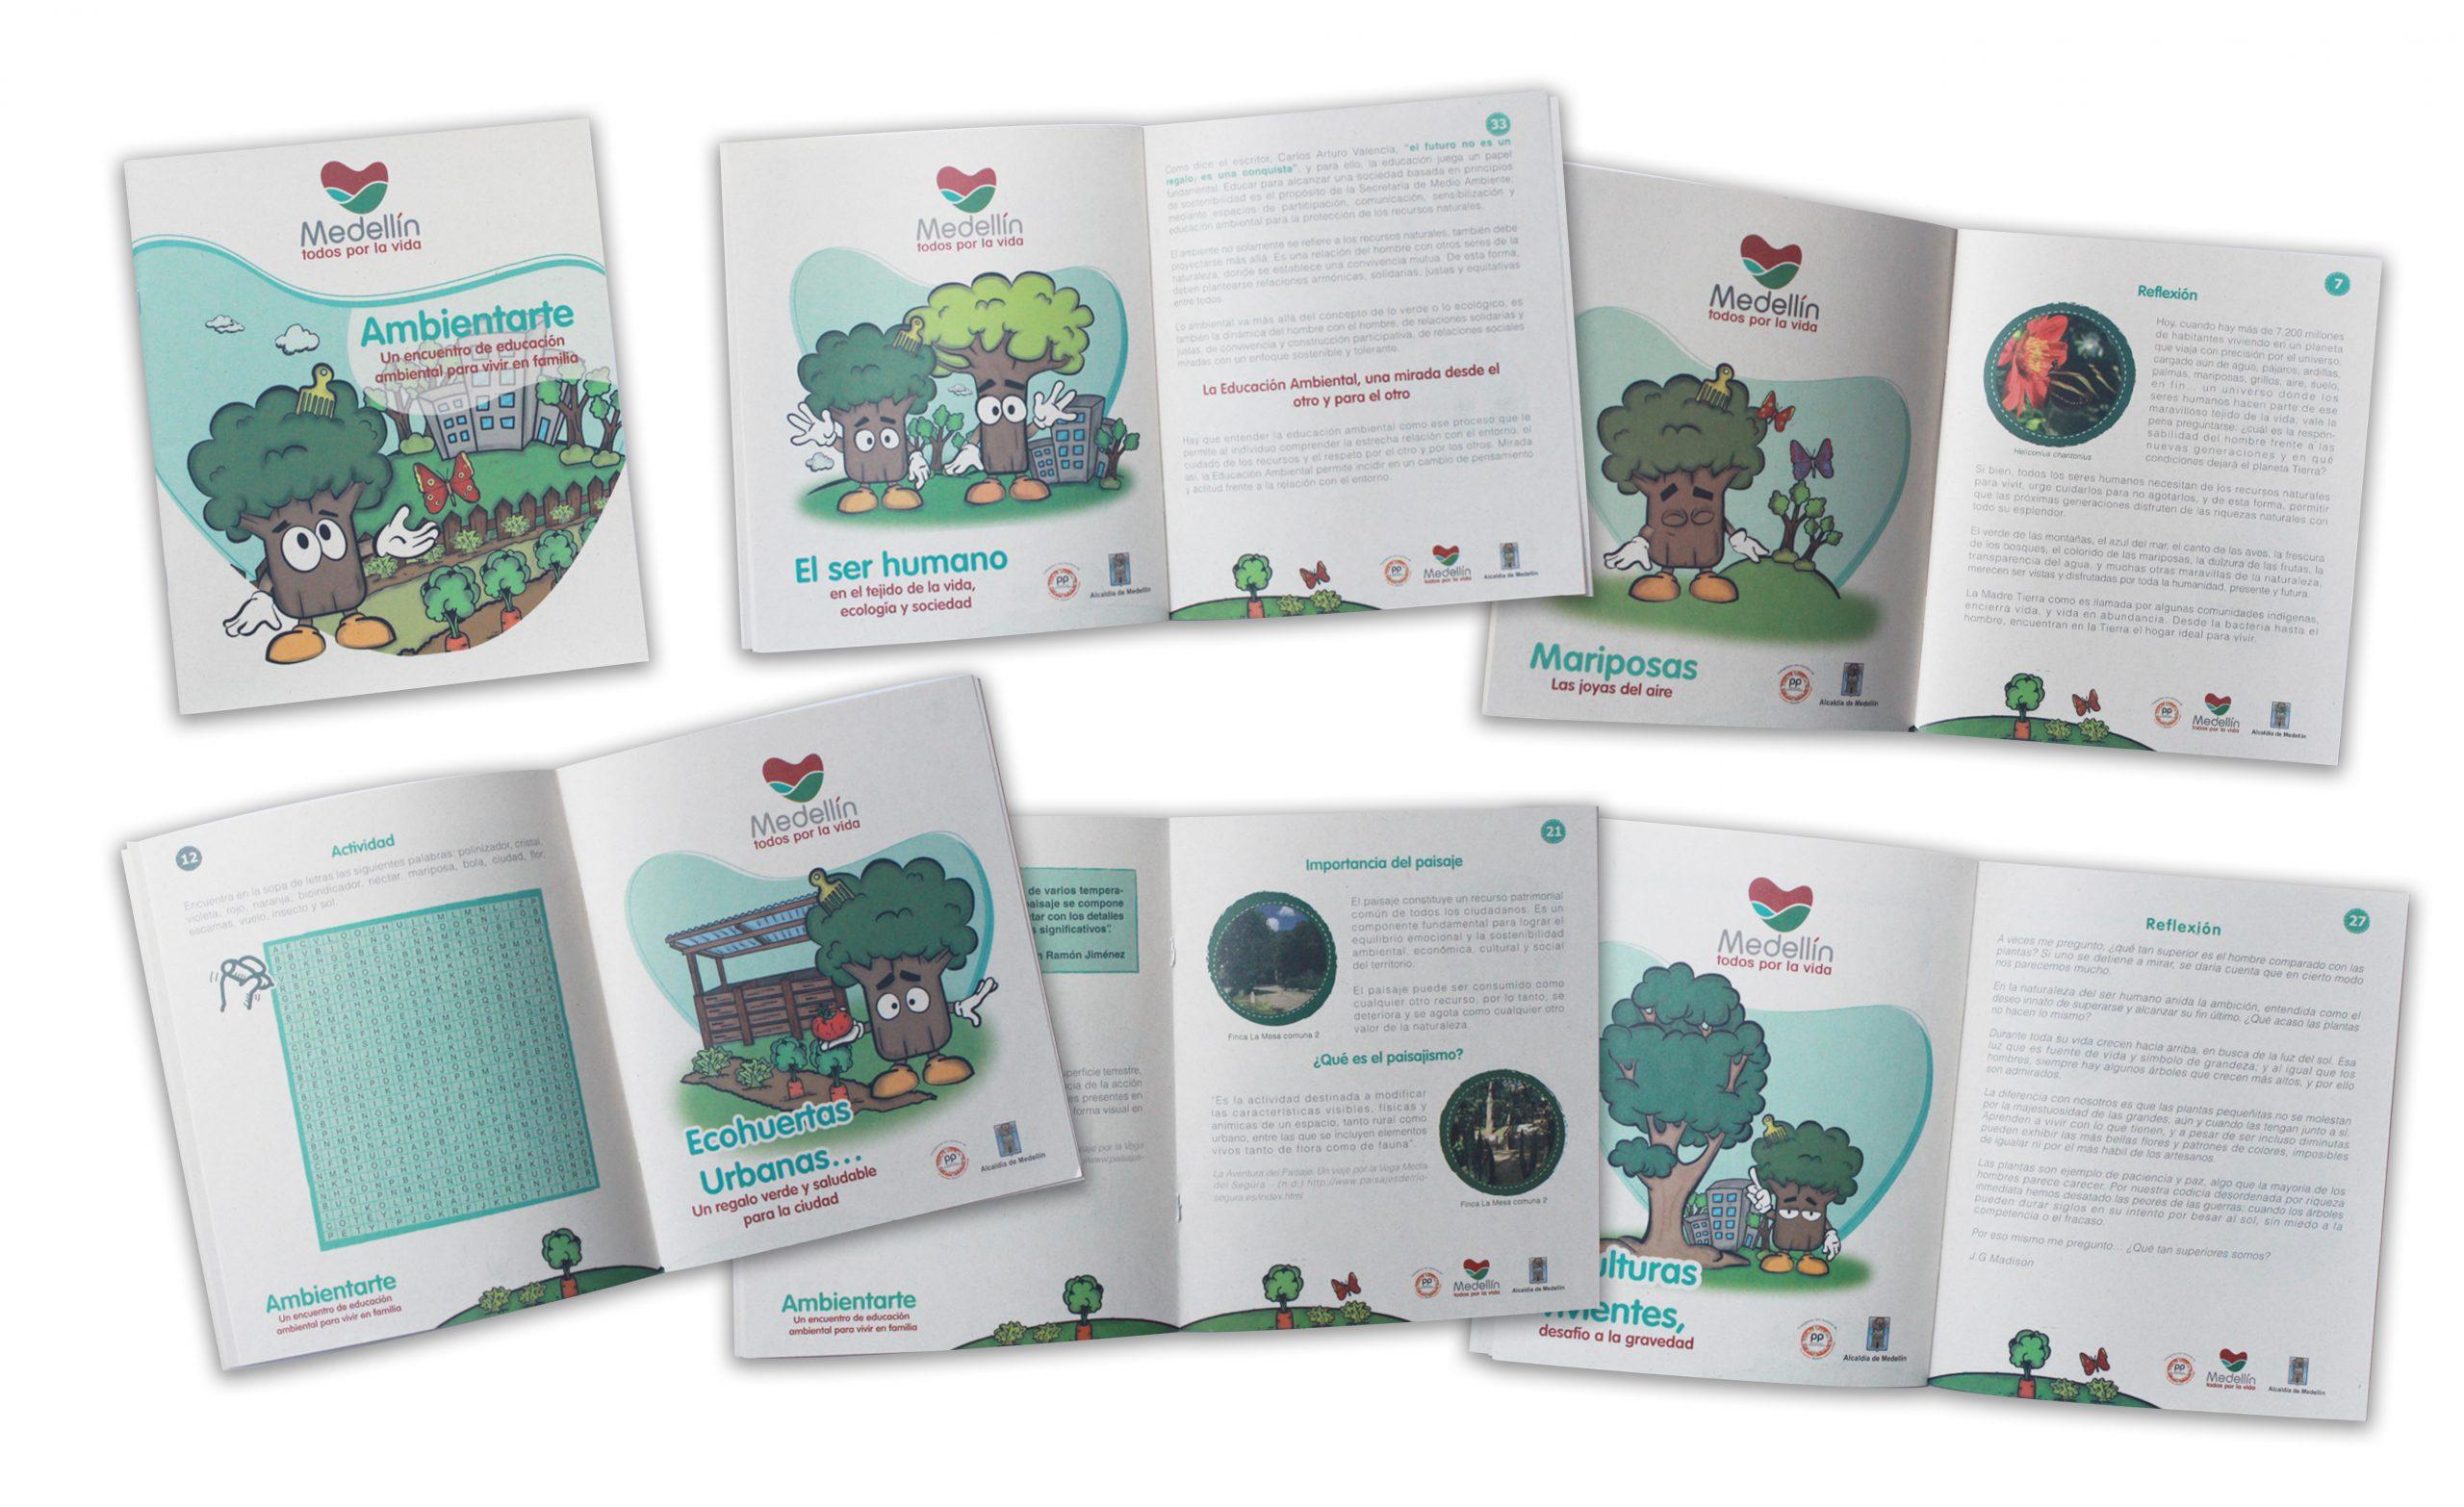 Ambientarte Campaign